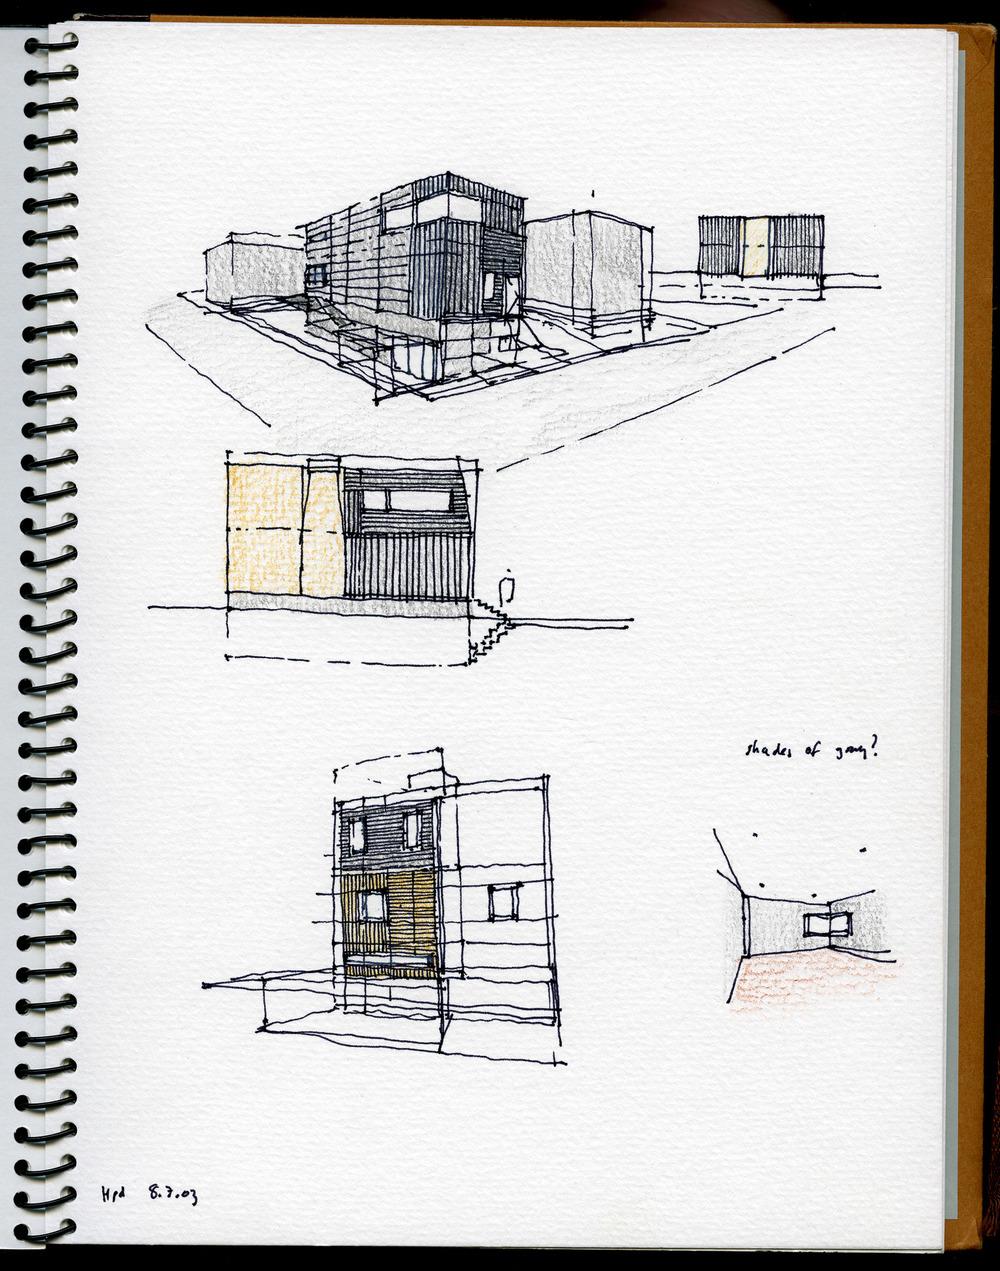 0210 - AB Sketch 1.jpg